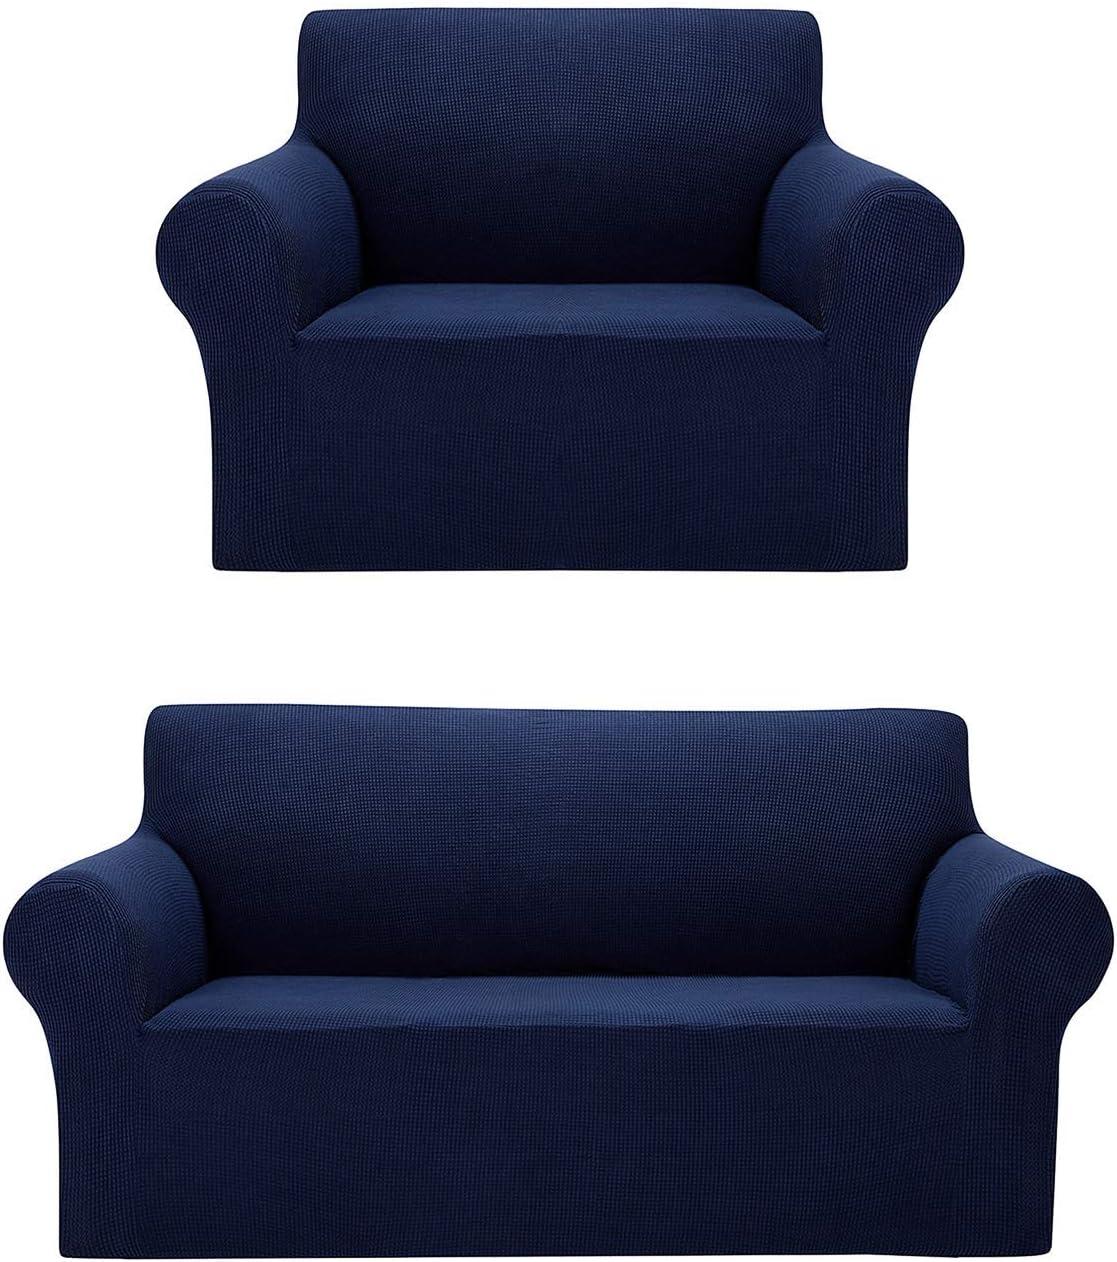 AlGaiety Chair Slipcover Bundles Loveseat Slipcover Navy